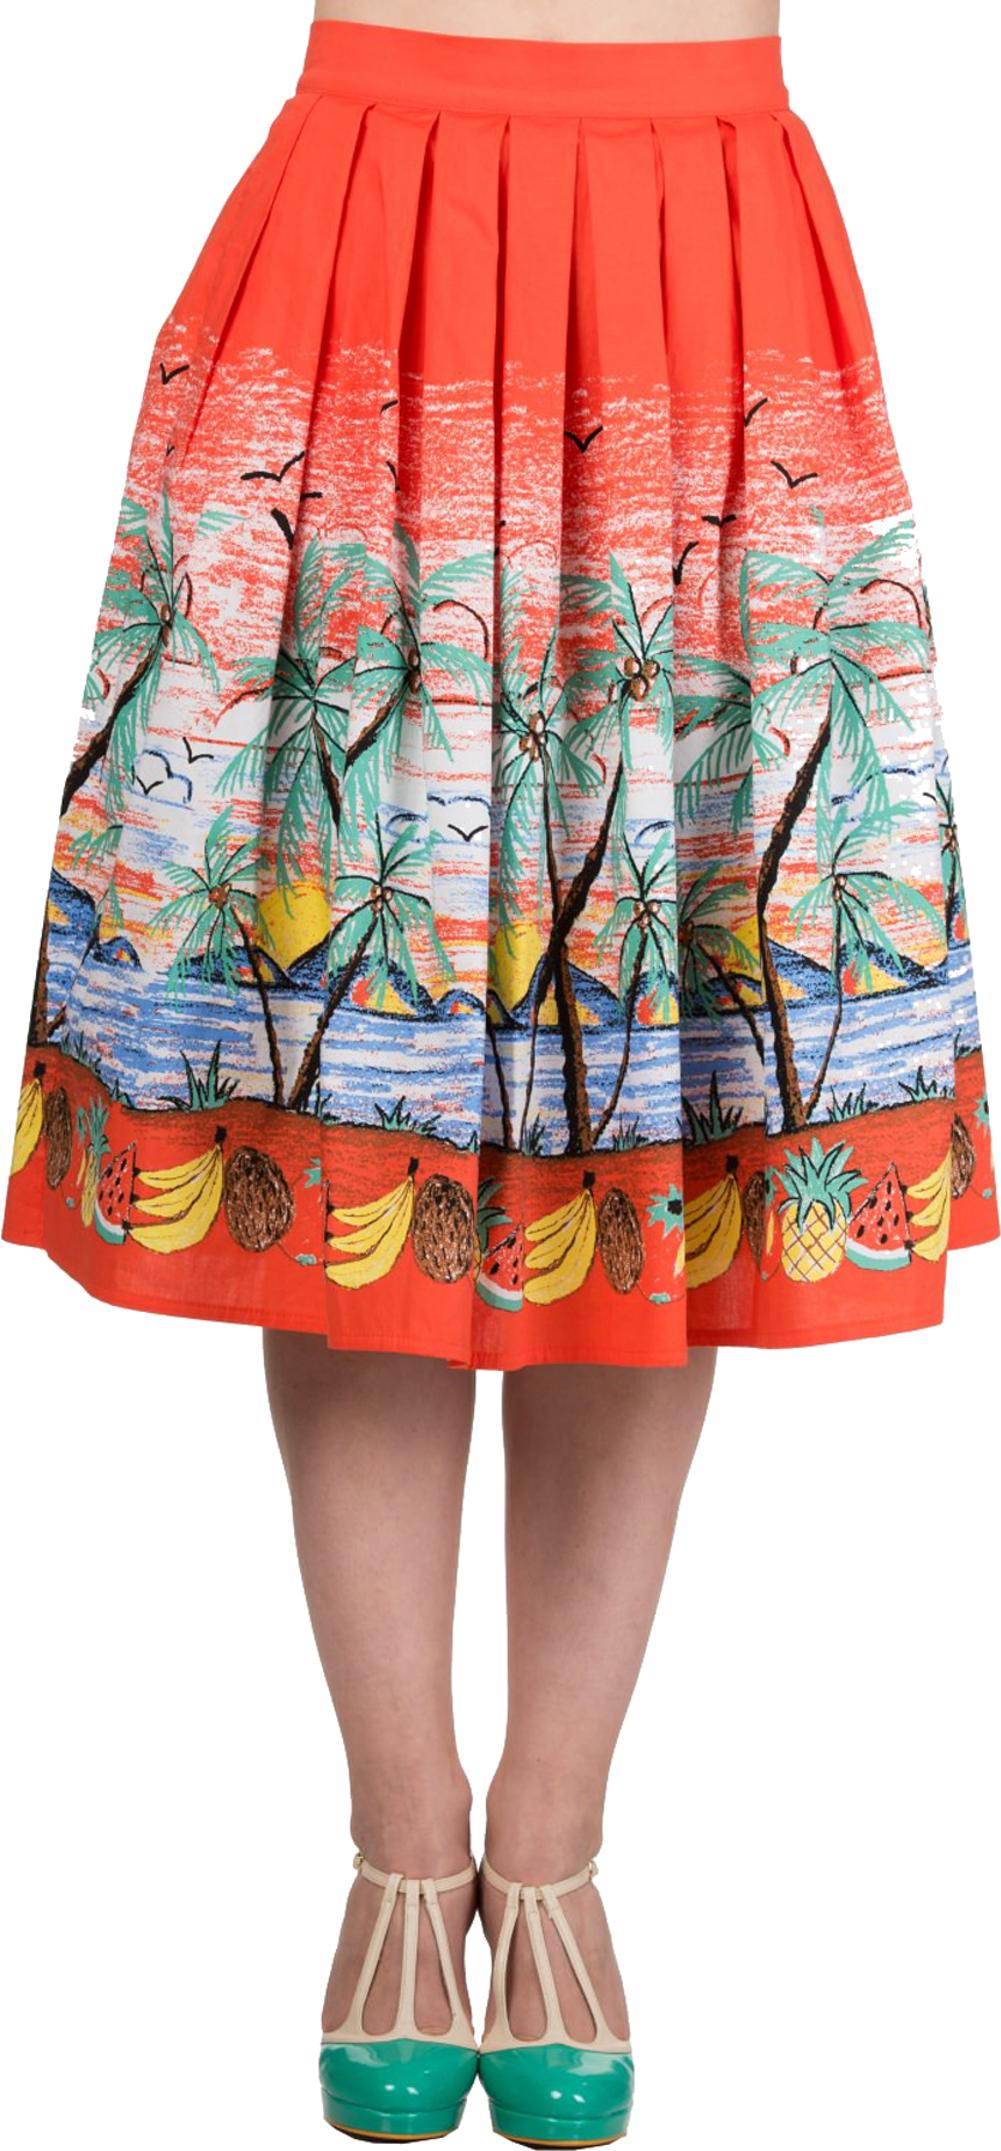 Küstenluder JEANNA Mohnblumen POPPIES Swing Skirt Vintage Rock Rockabilly